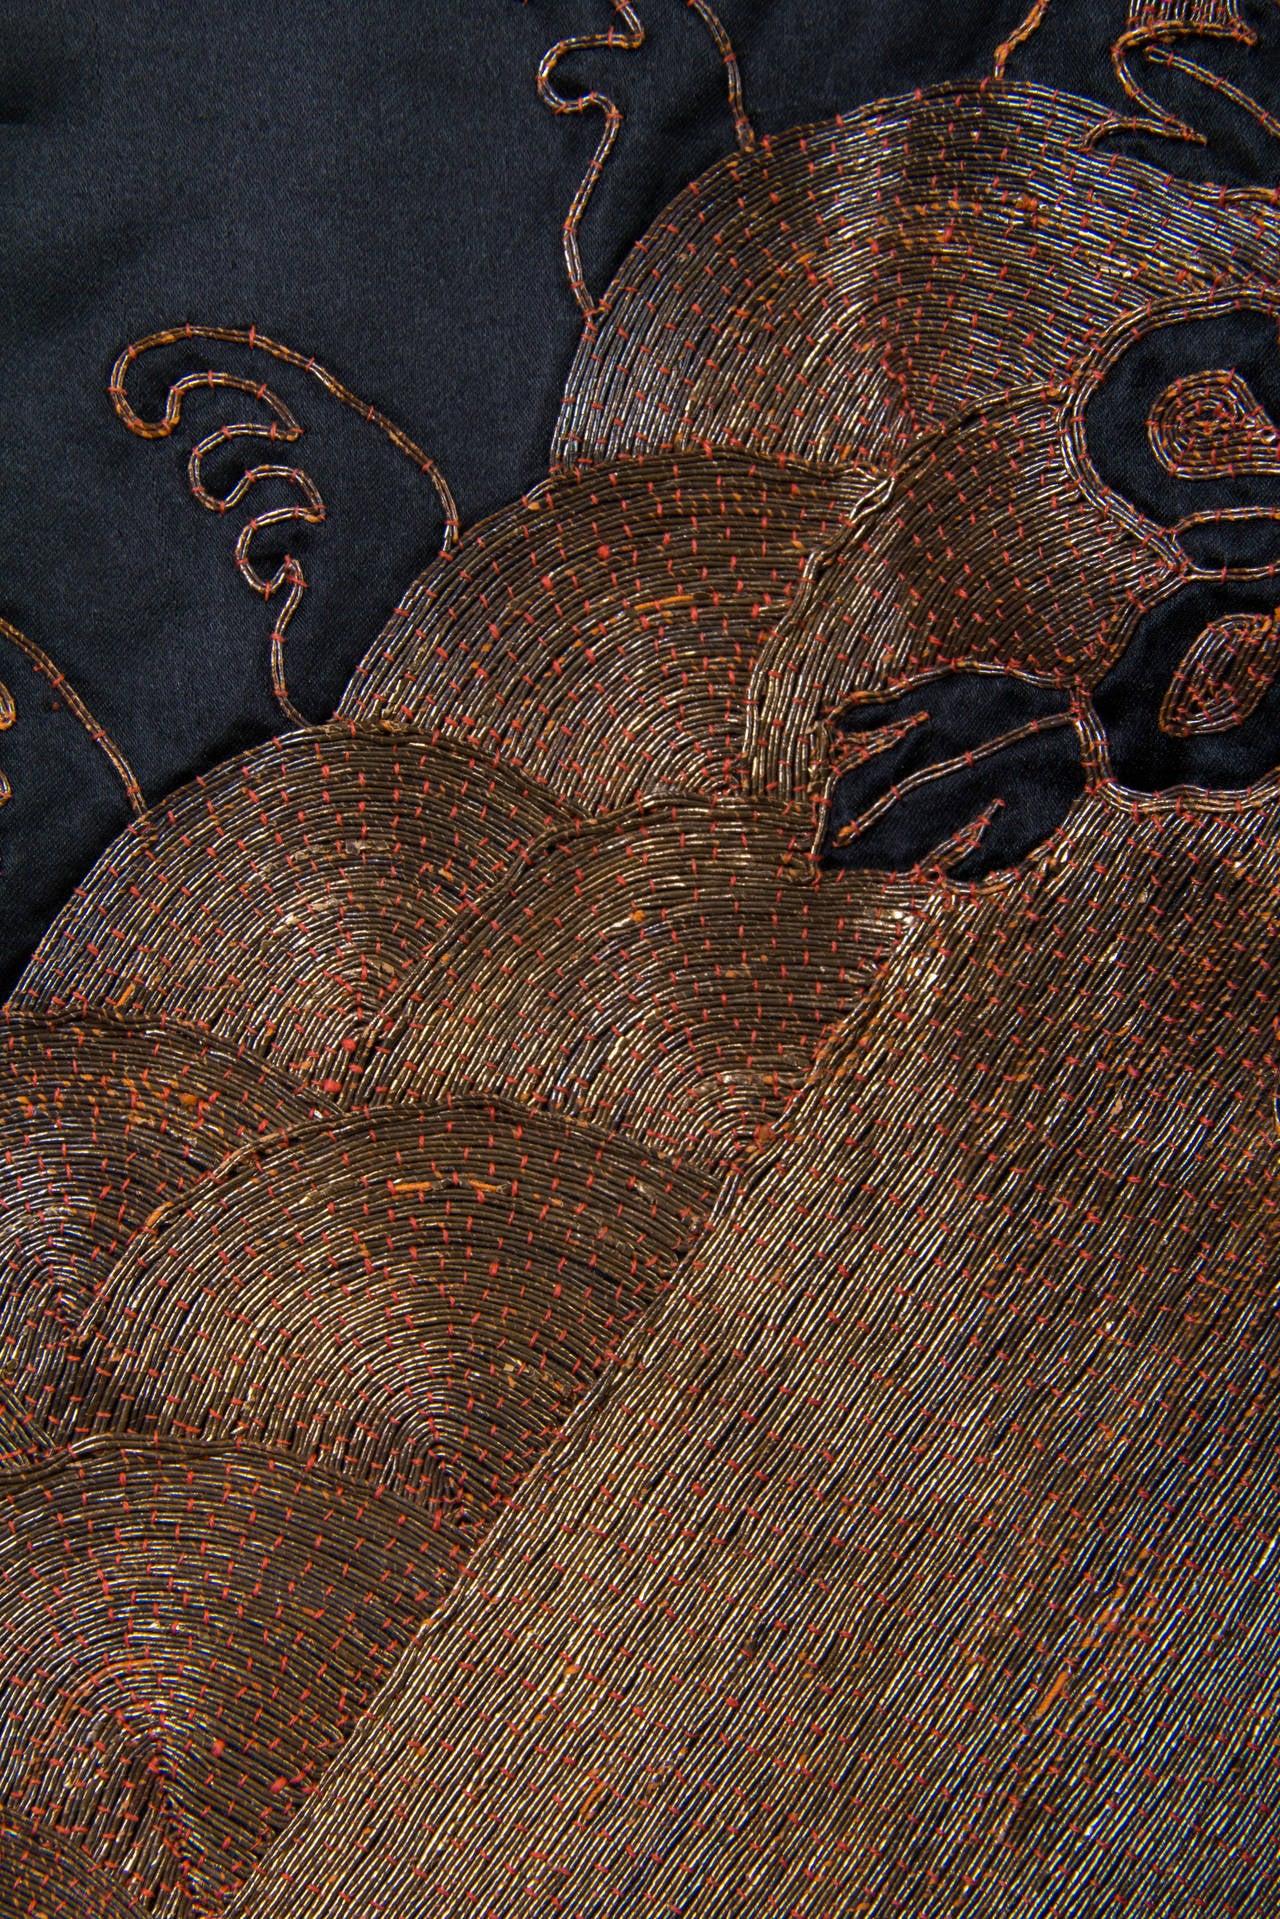 Early Chinese Embroidered Jacket Kimono style 7